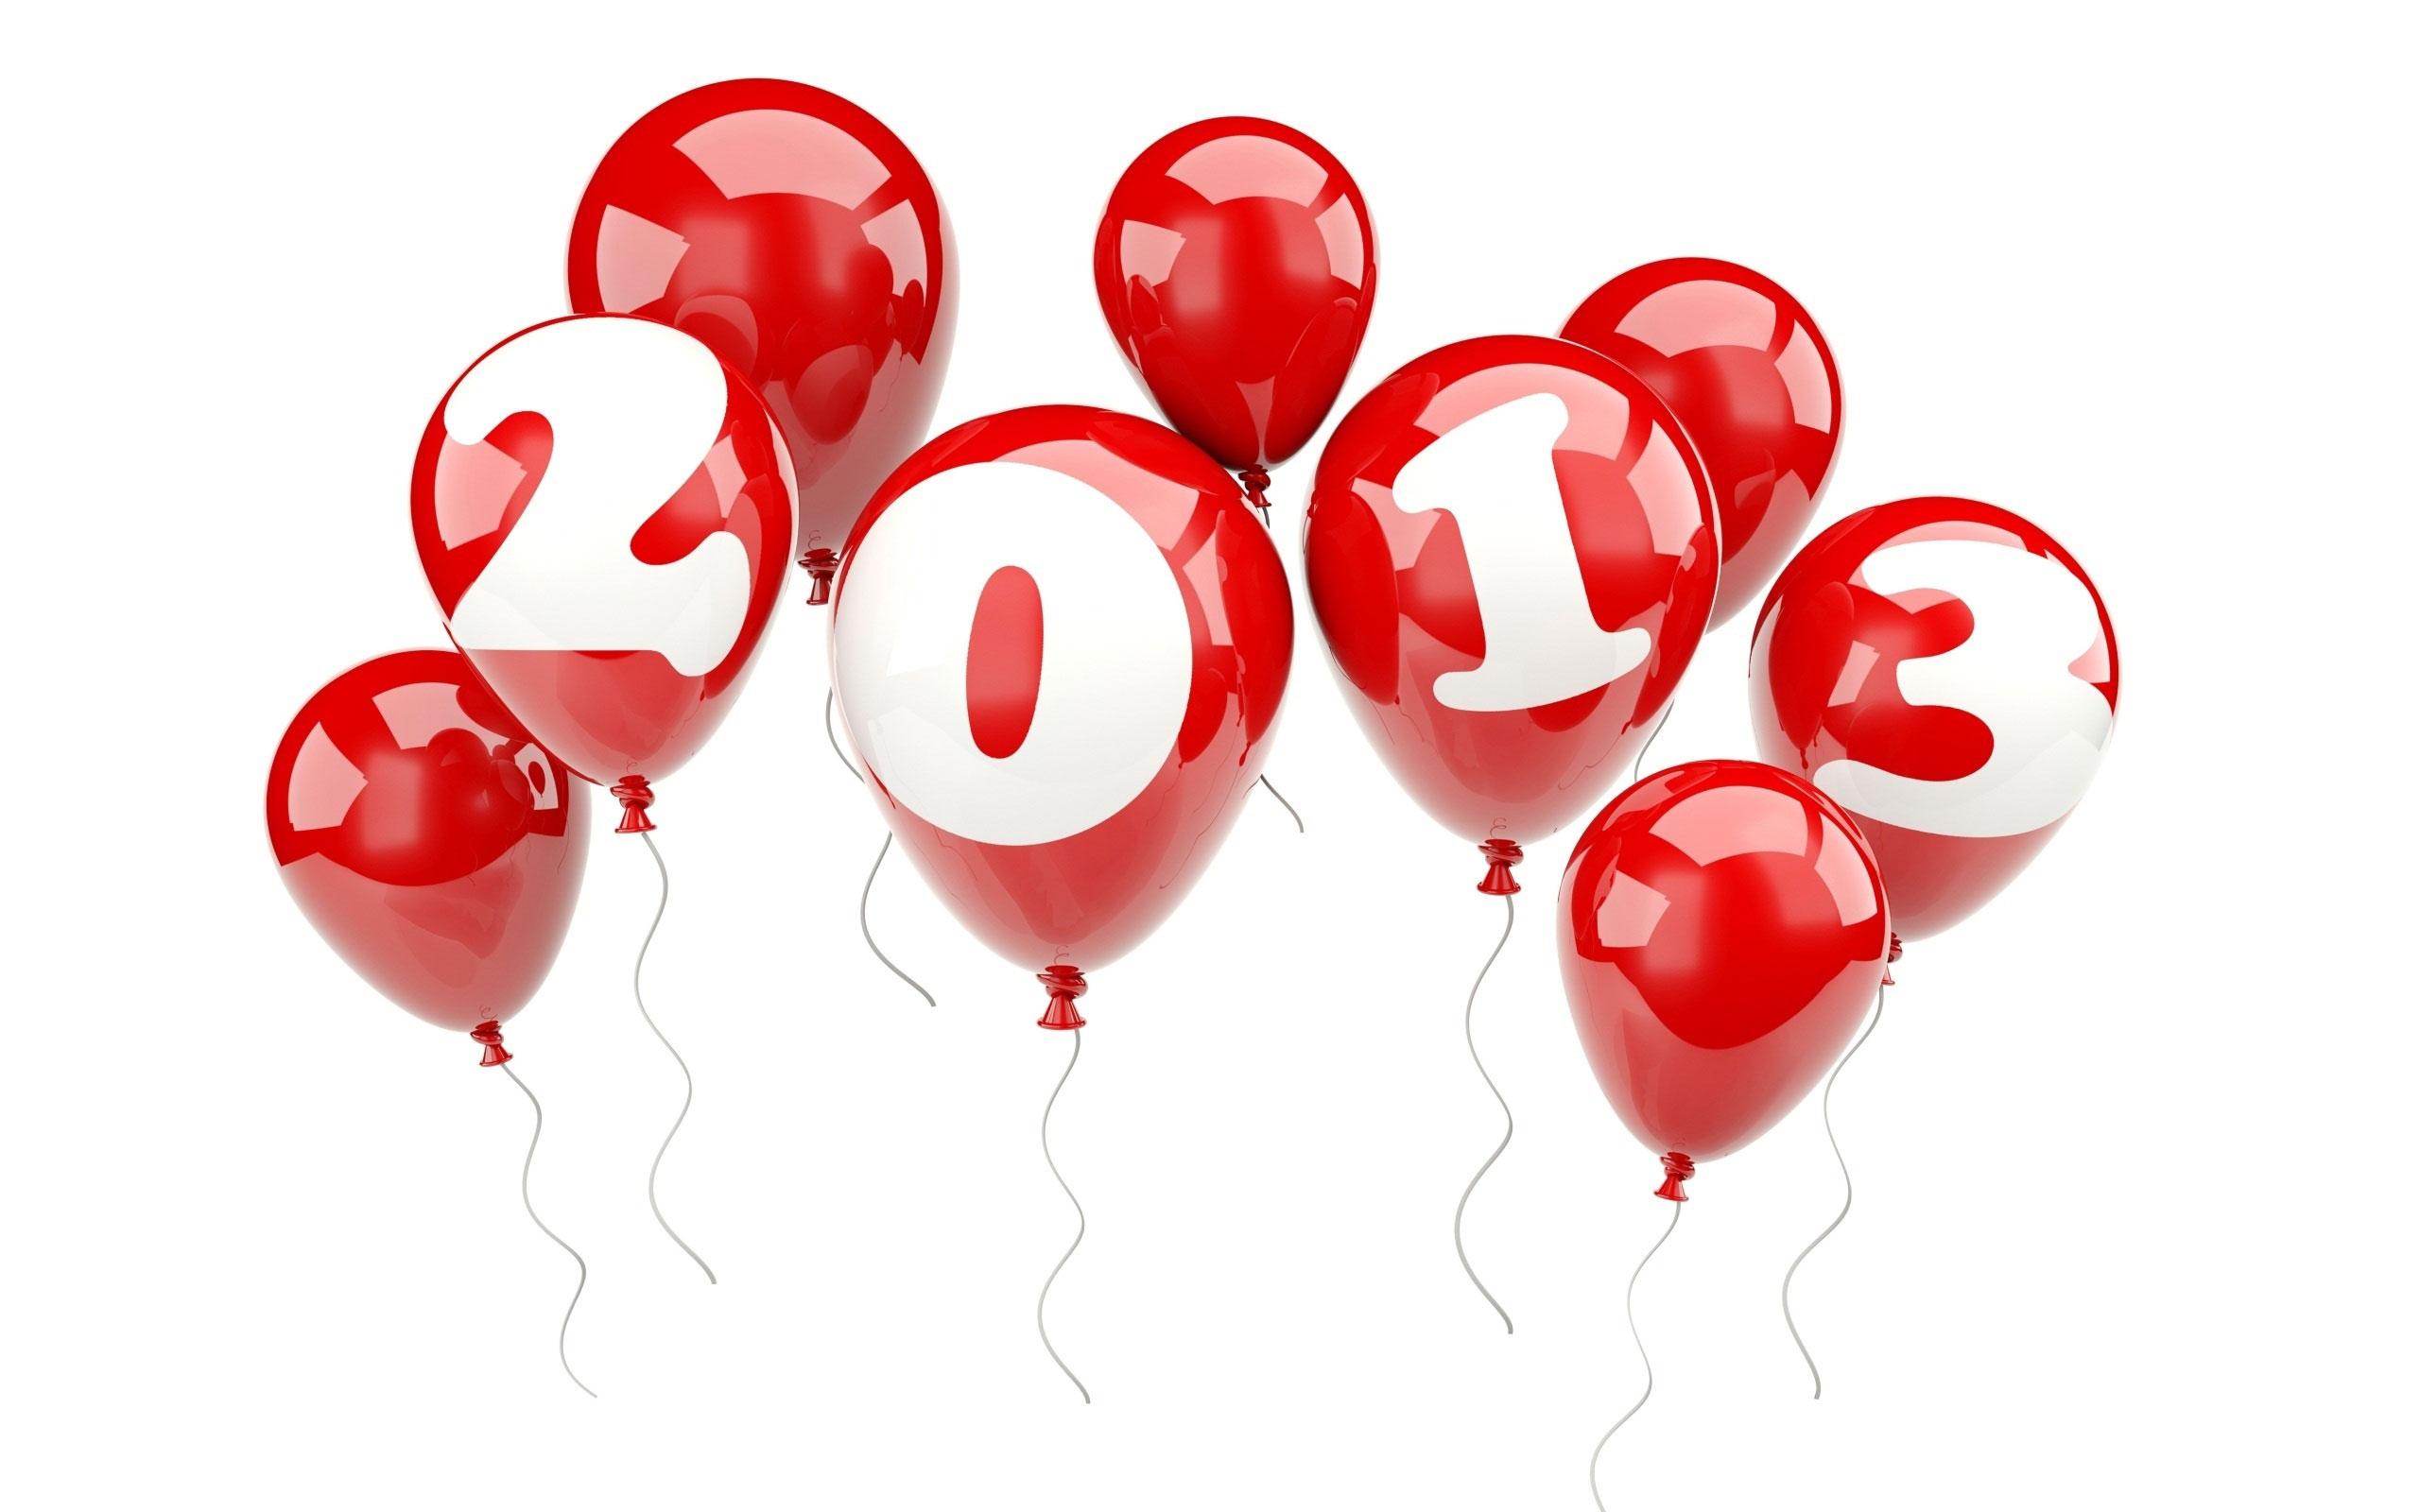 كل عام وانتم بالف خير  Happy-new-year-2013-hd-wallpapers-23